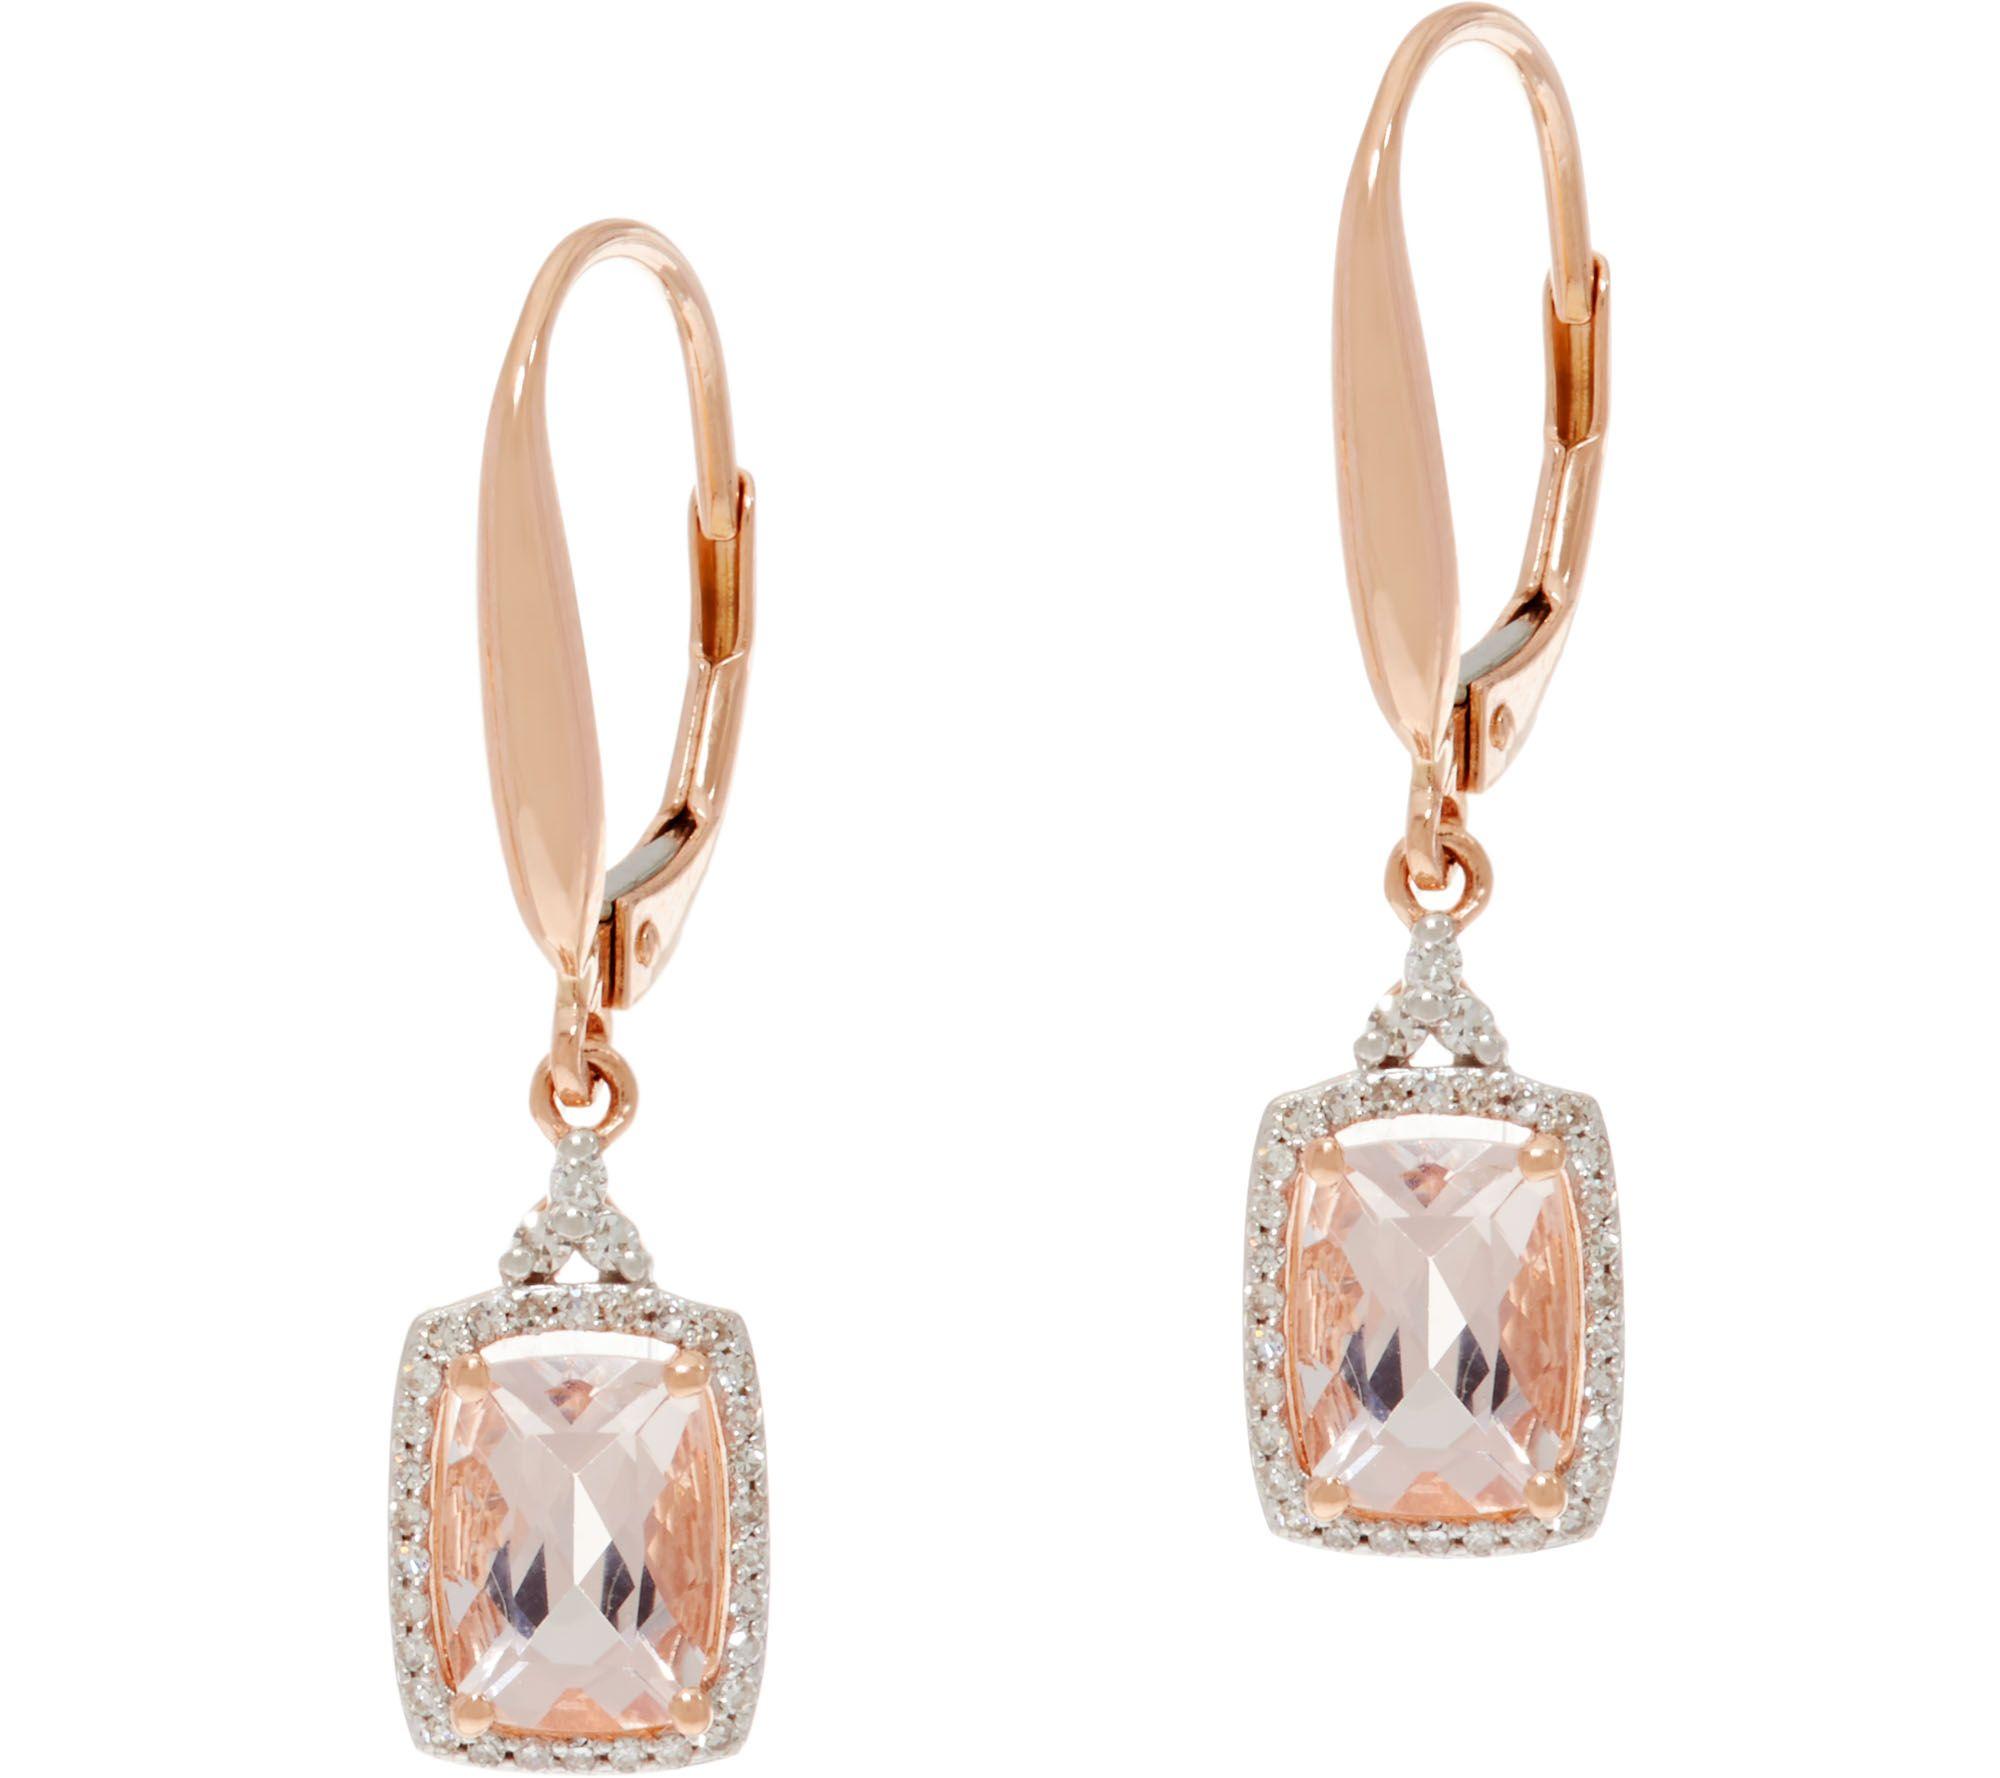 Elongated Cushion Cut Morganite & Diamond Drop Earrings, 14k  Page 1 —  Qvc